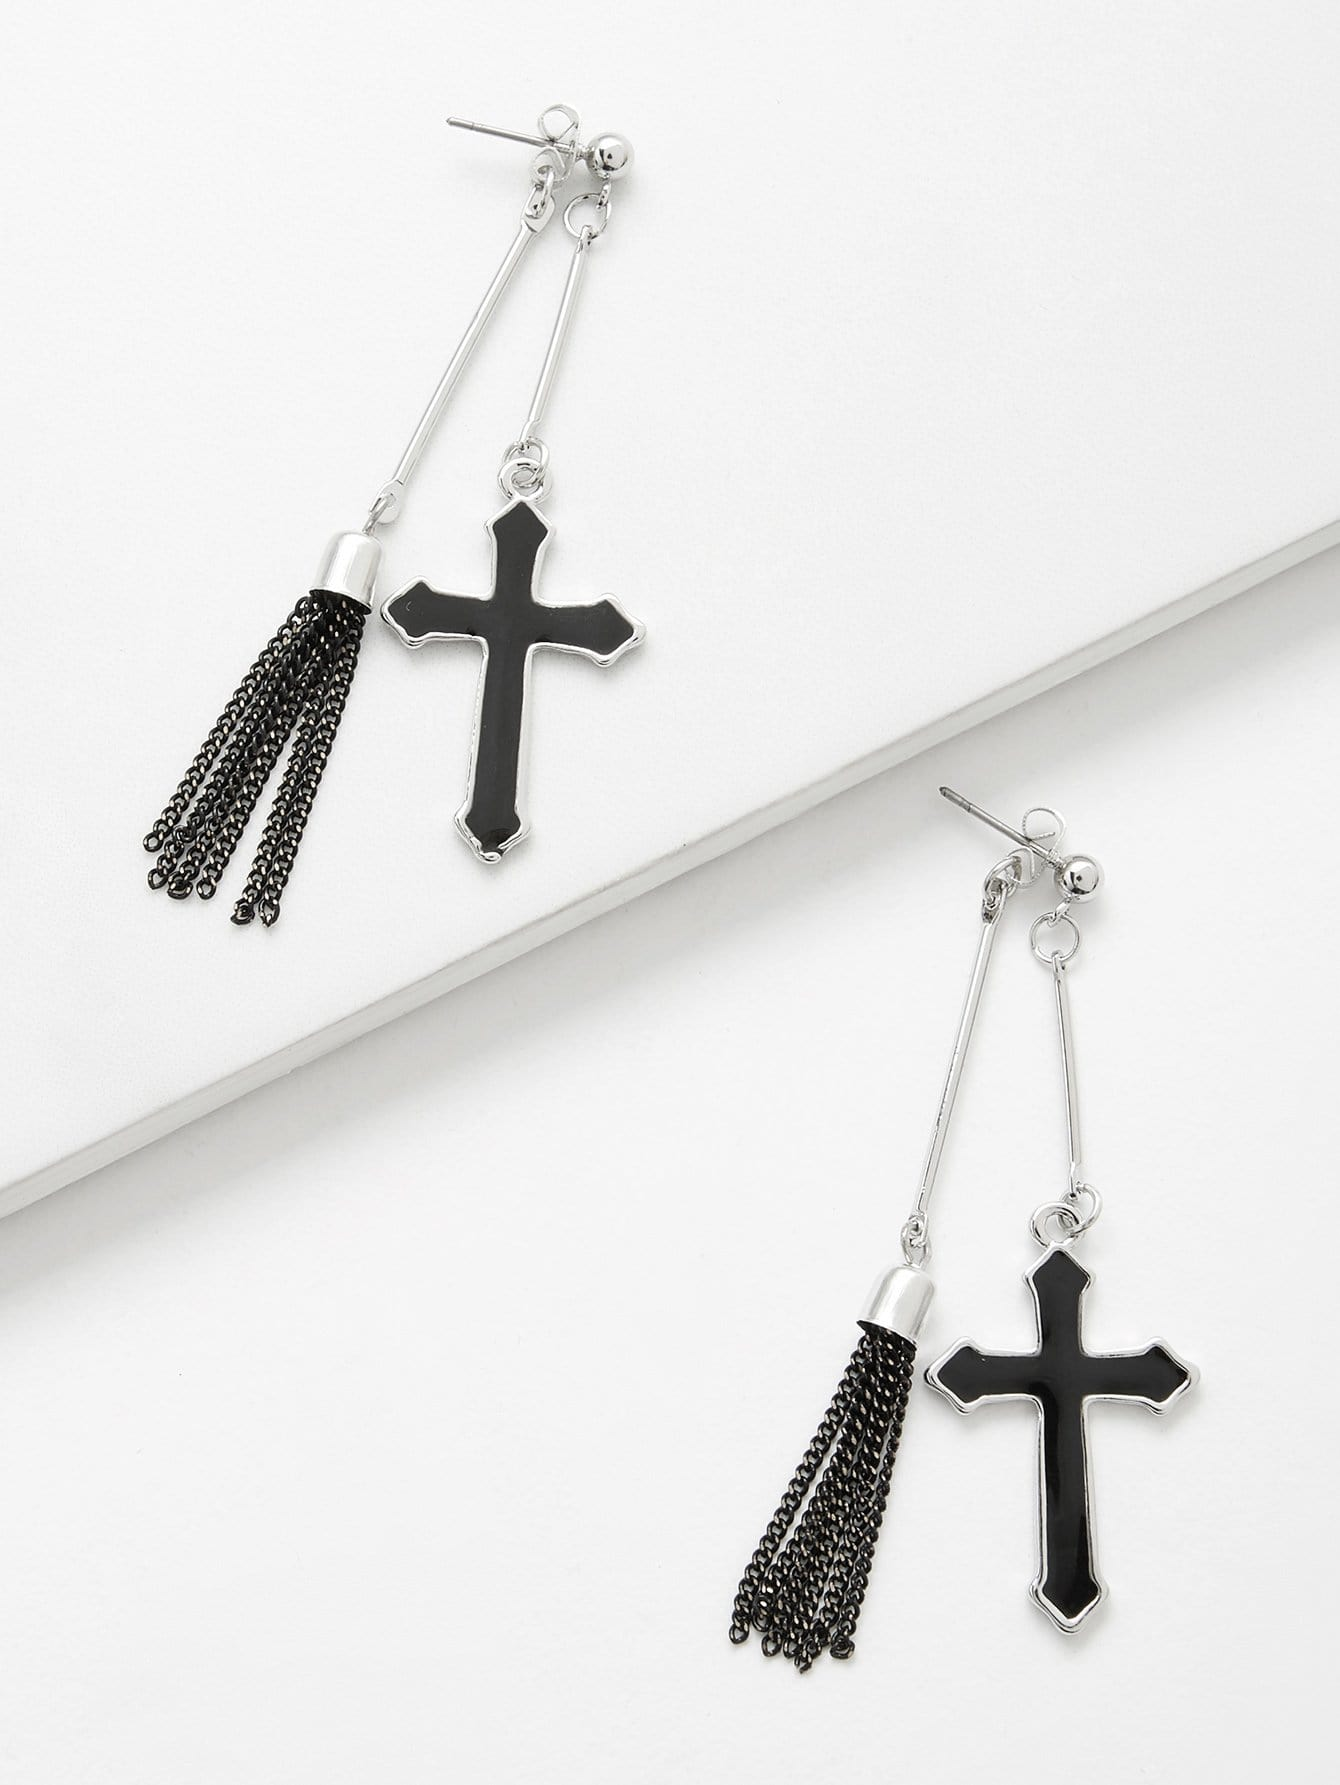 Cross & Bar Detail Drop Earrings silver plated bar dangle drop earrings